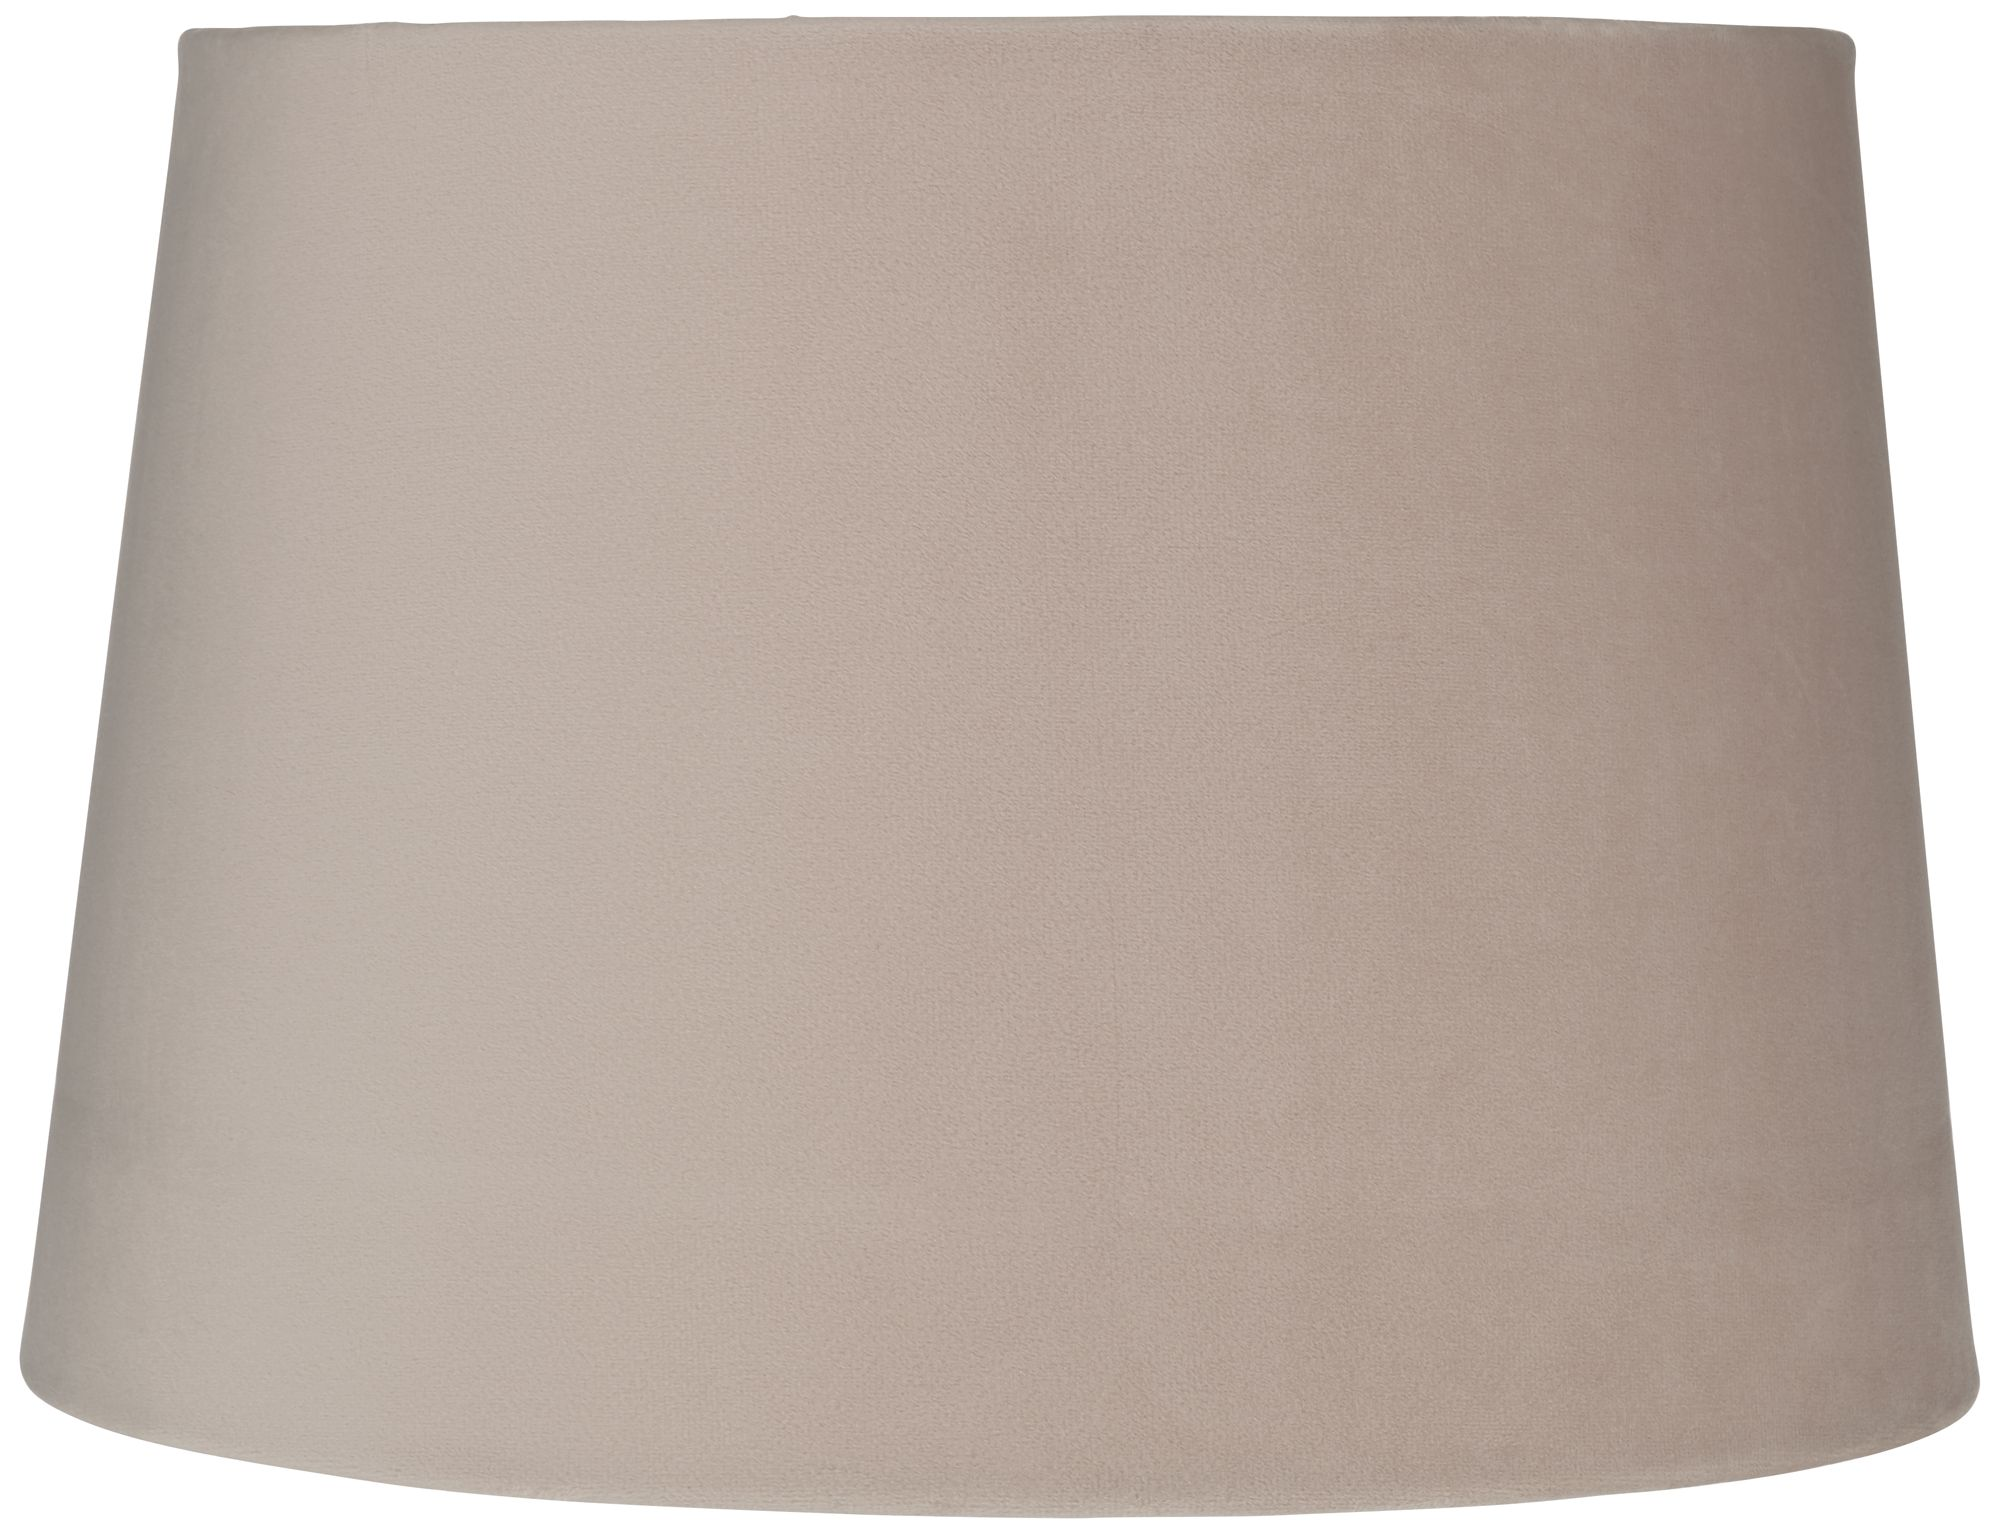 Beige Velvet Hardback Drum Lamp Shade 11x13x9 (Spider)